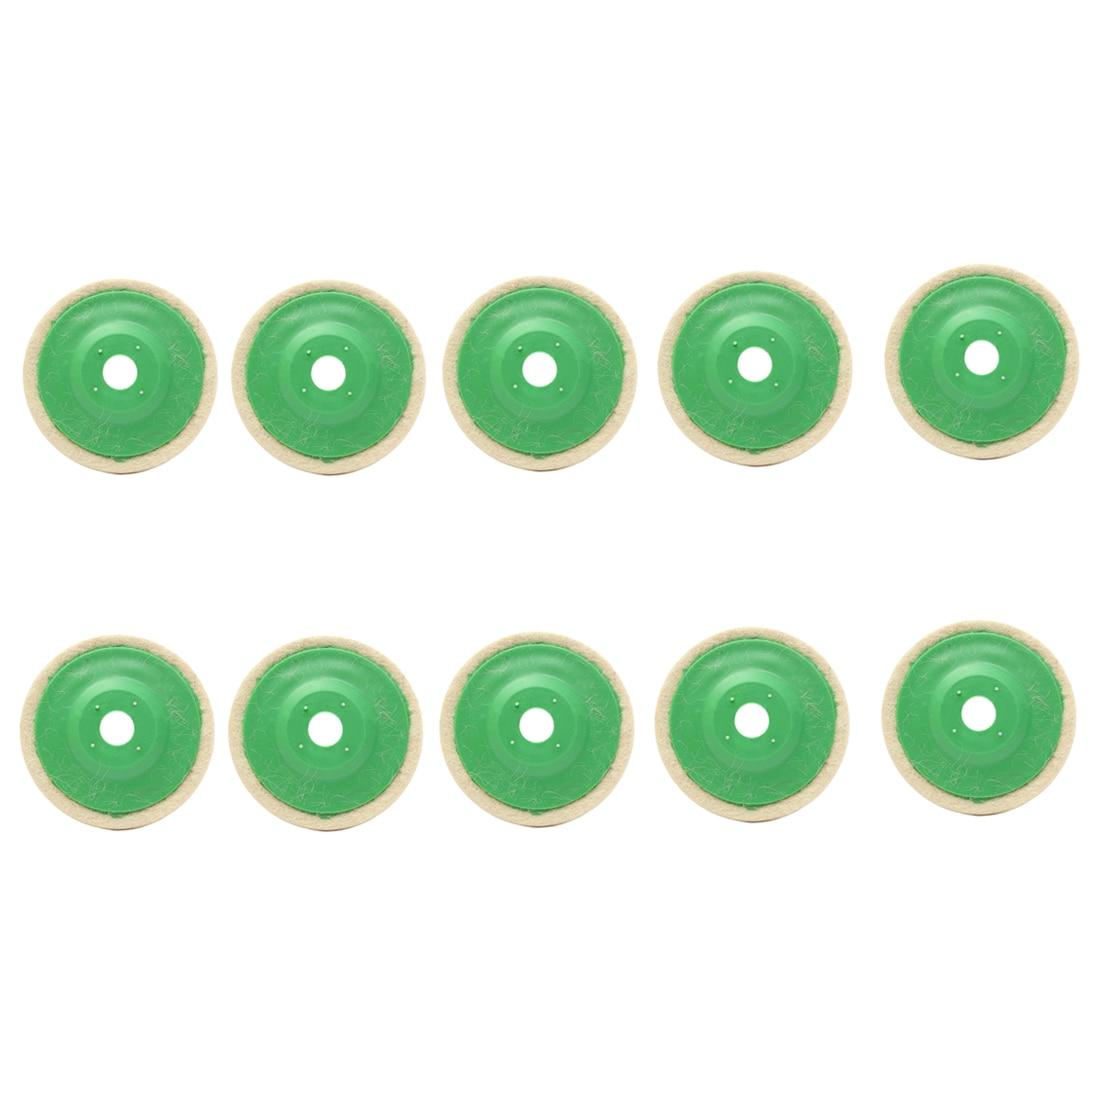 BIFI-10pcs 100mm 4 Inch Round Wool Buffing Pad Polishing Wheel Felt Buffer Disc Set